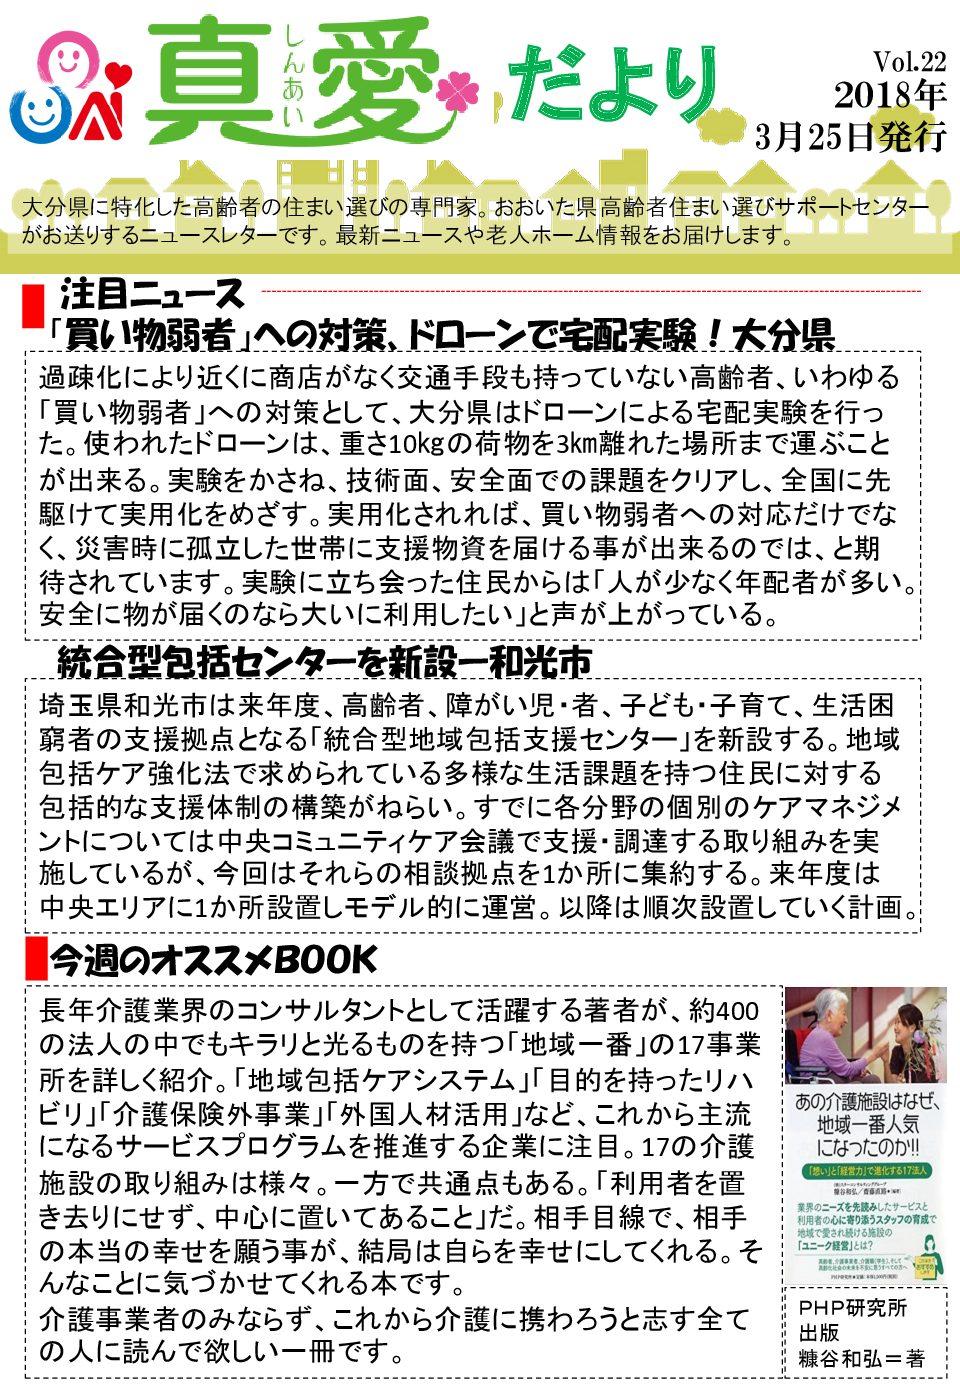 【Vol.22】 2018.03.25発行